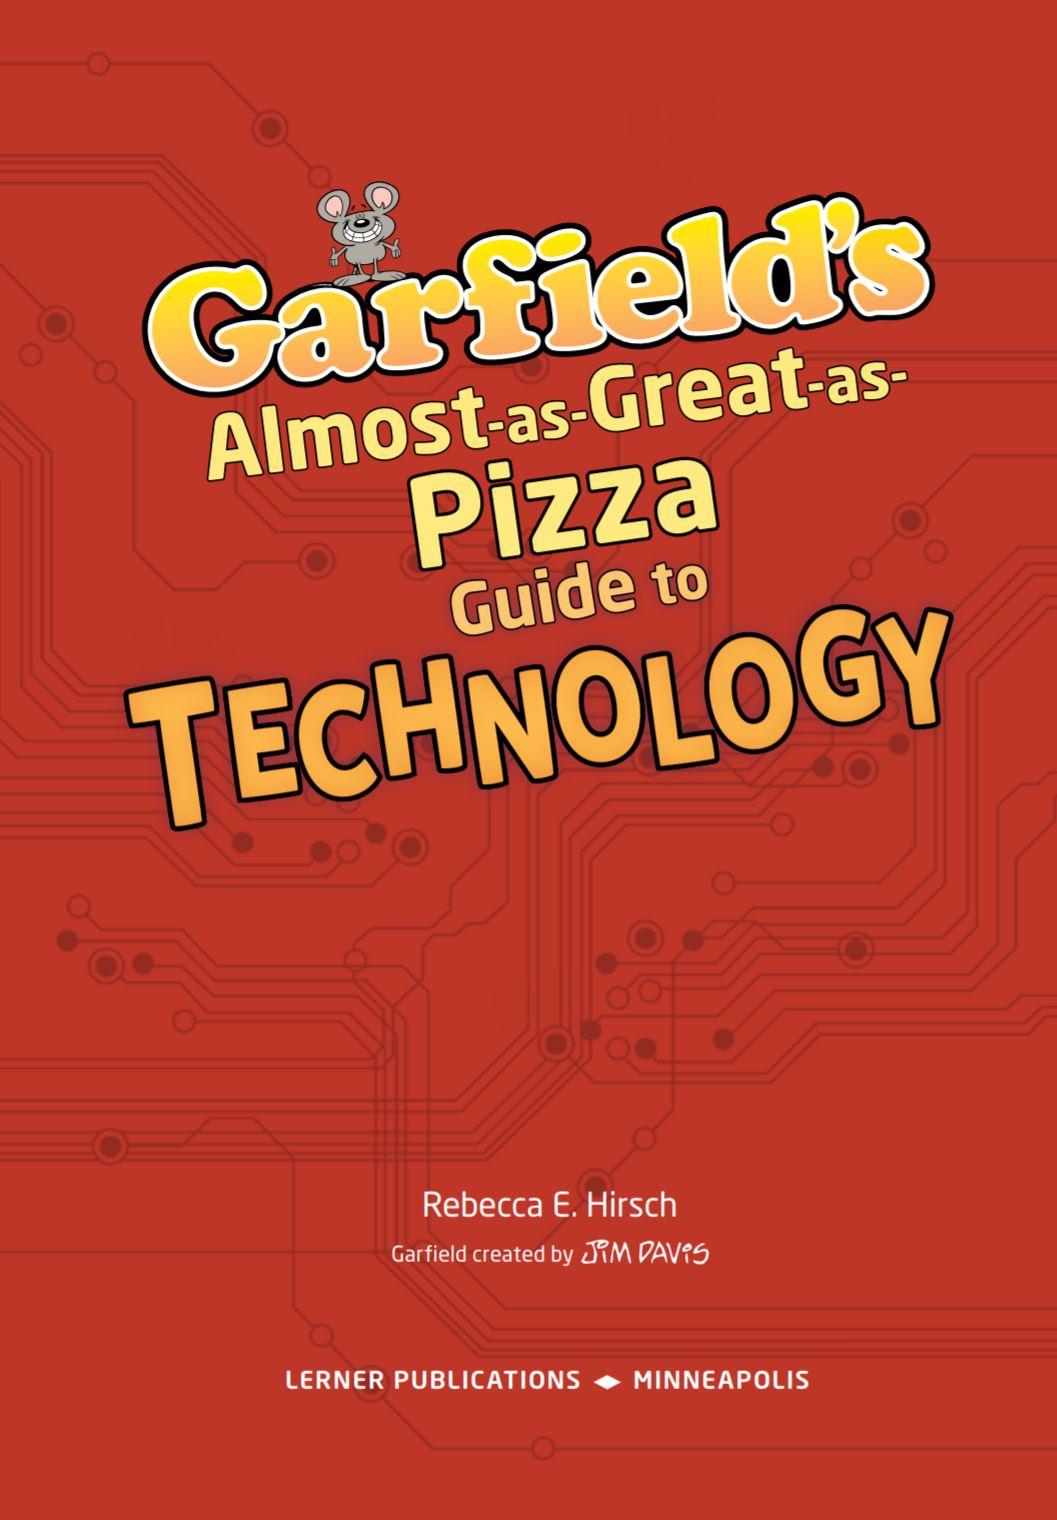 garfield-1.JPG